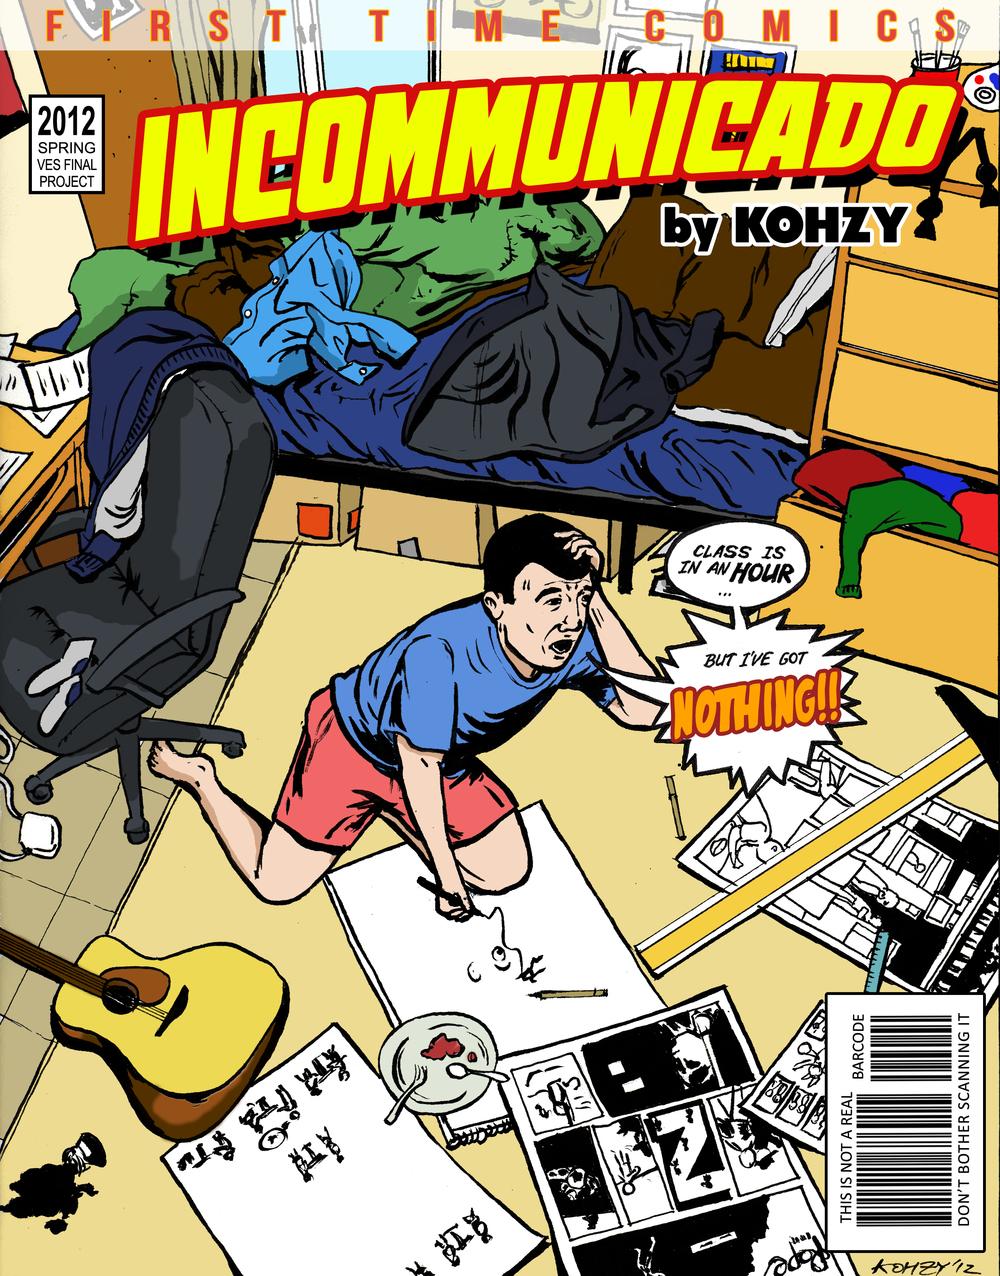 Cover of Incommunicado Magazine